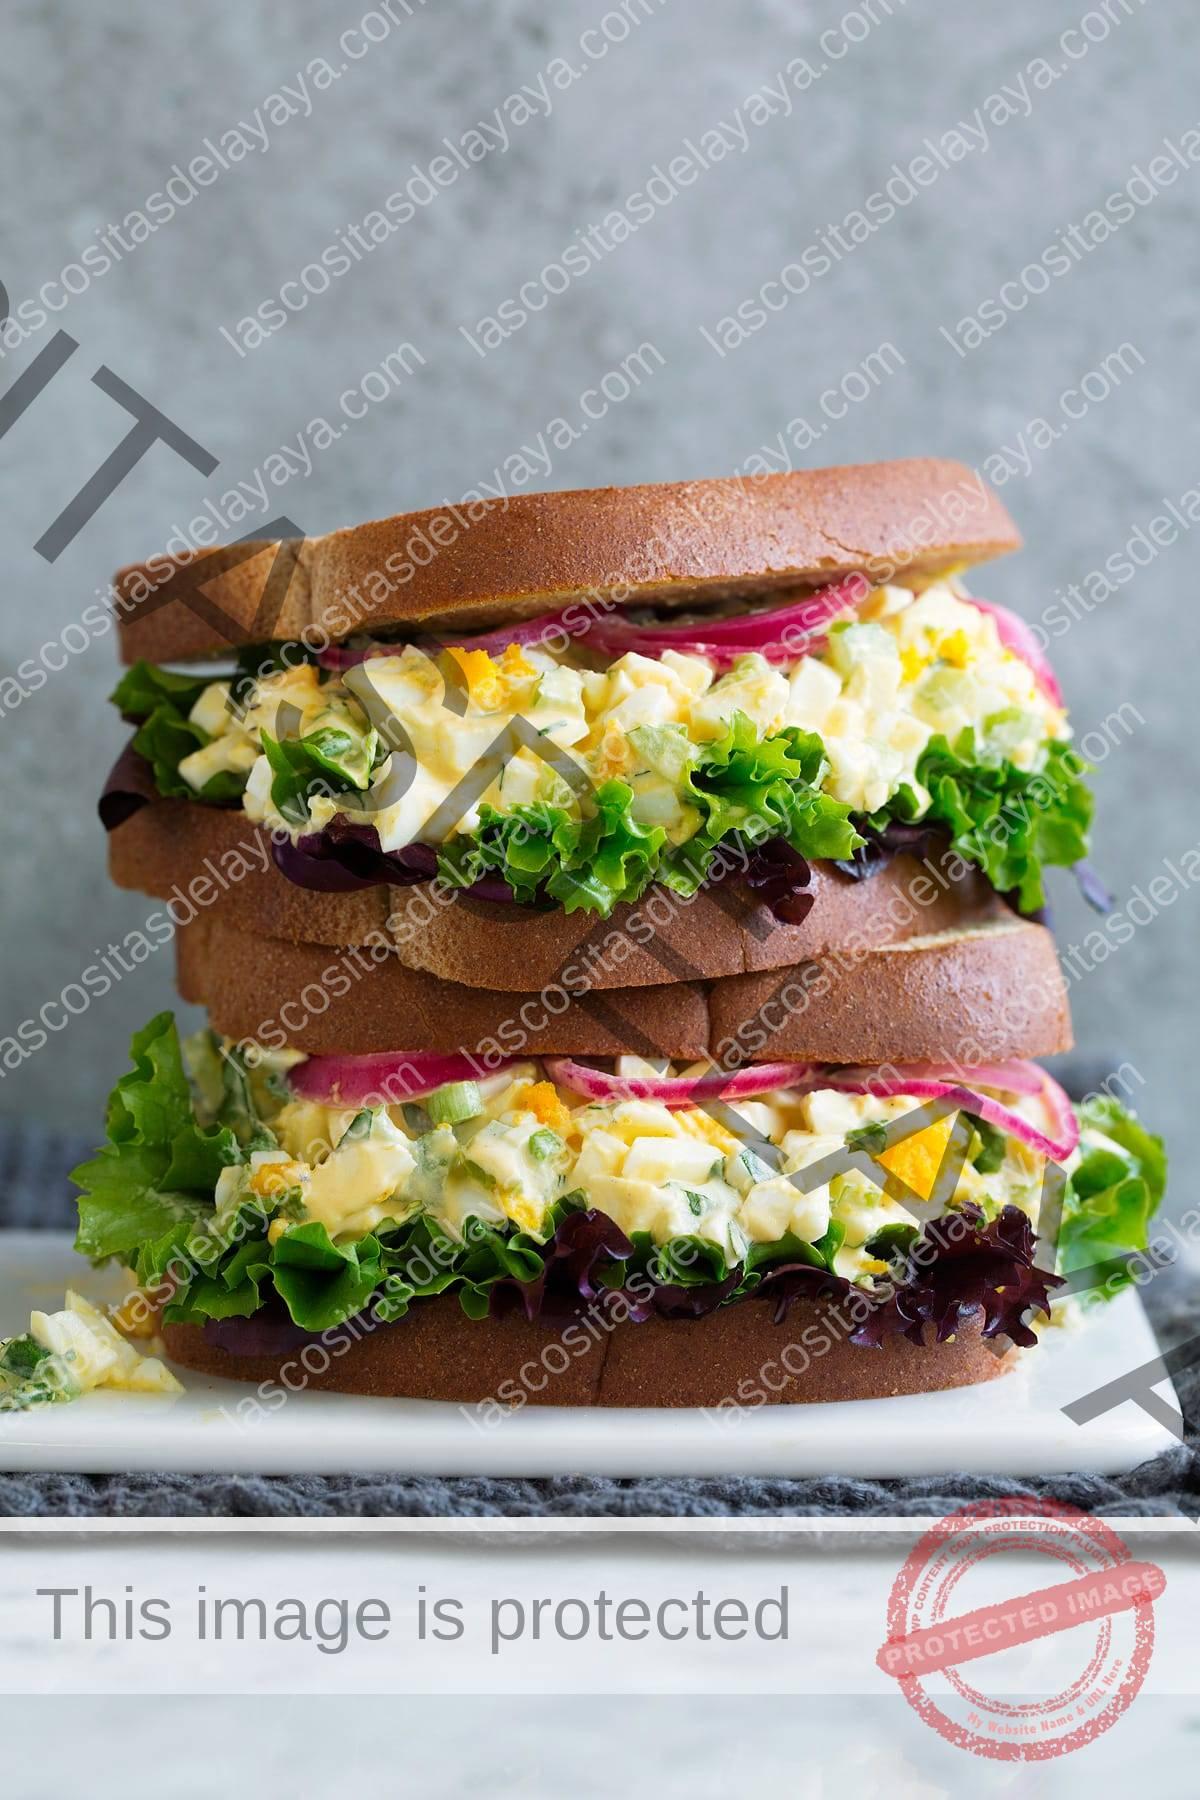 Pila de dos sándwiches de ensalada de huevo en un plato blanco sentado sobre mármol con un fondo gris.